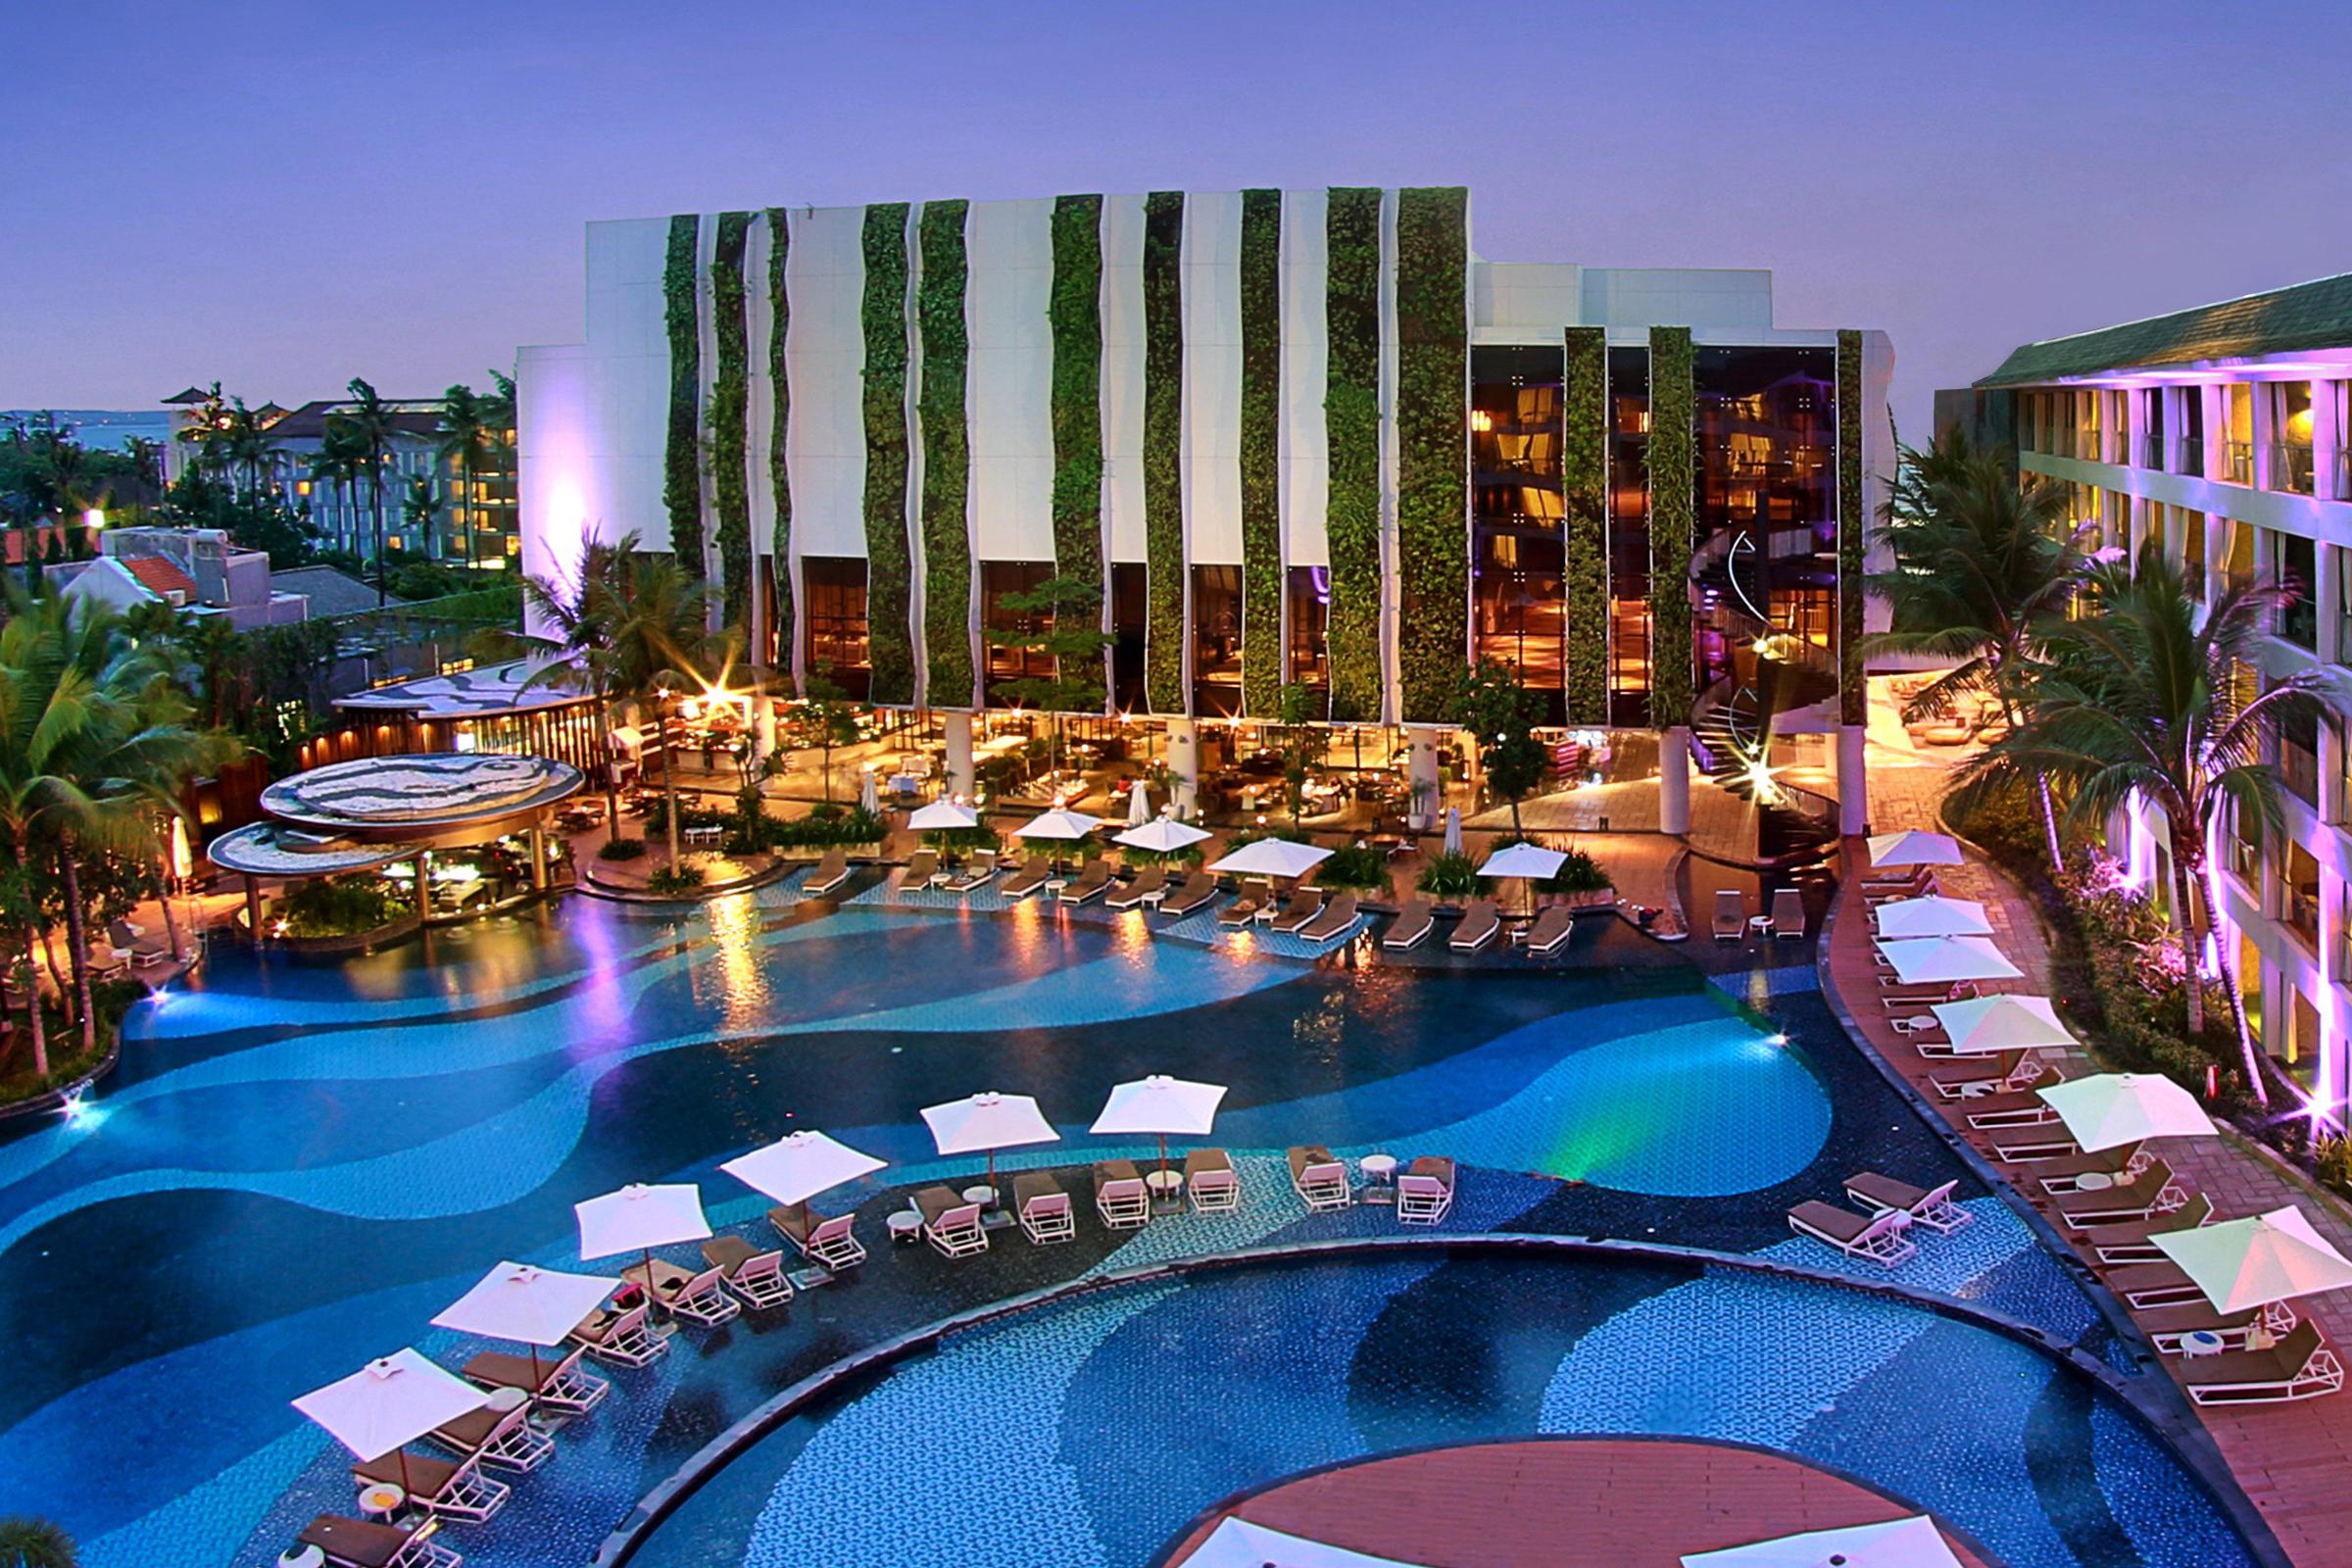 The Stones Hotel in Bali